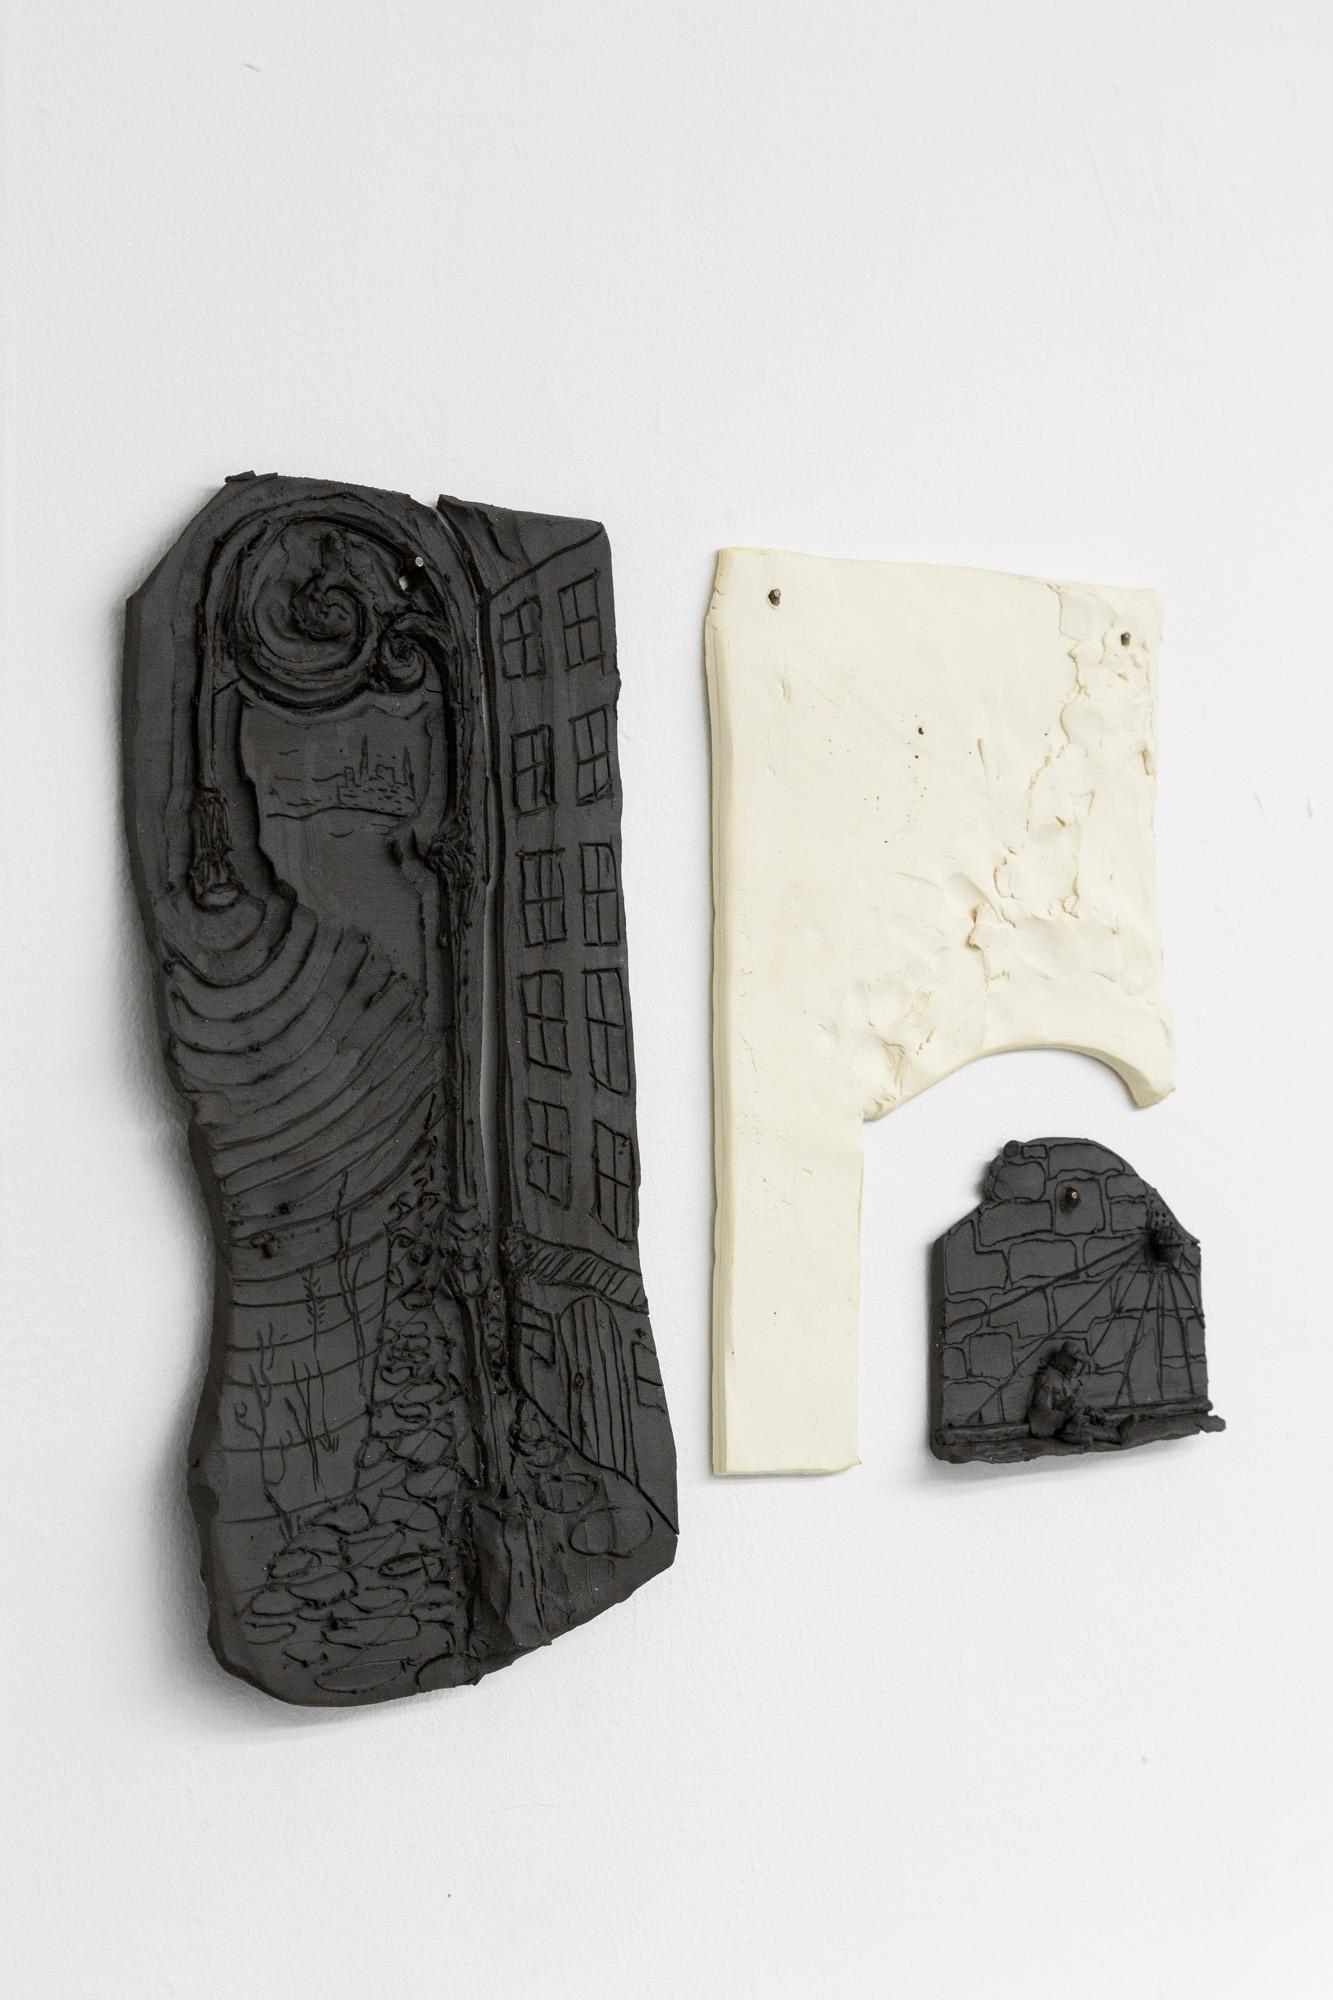 Tom Forkin, Manhattan (detail),  2017,unglazed ceramic,14 x 16 x 0.5 in